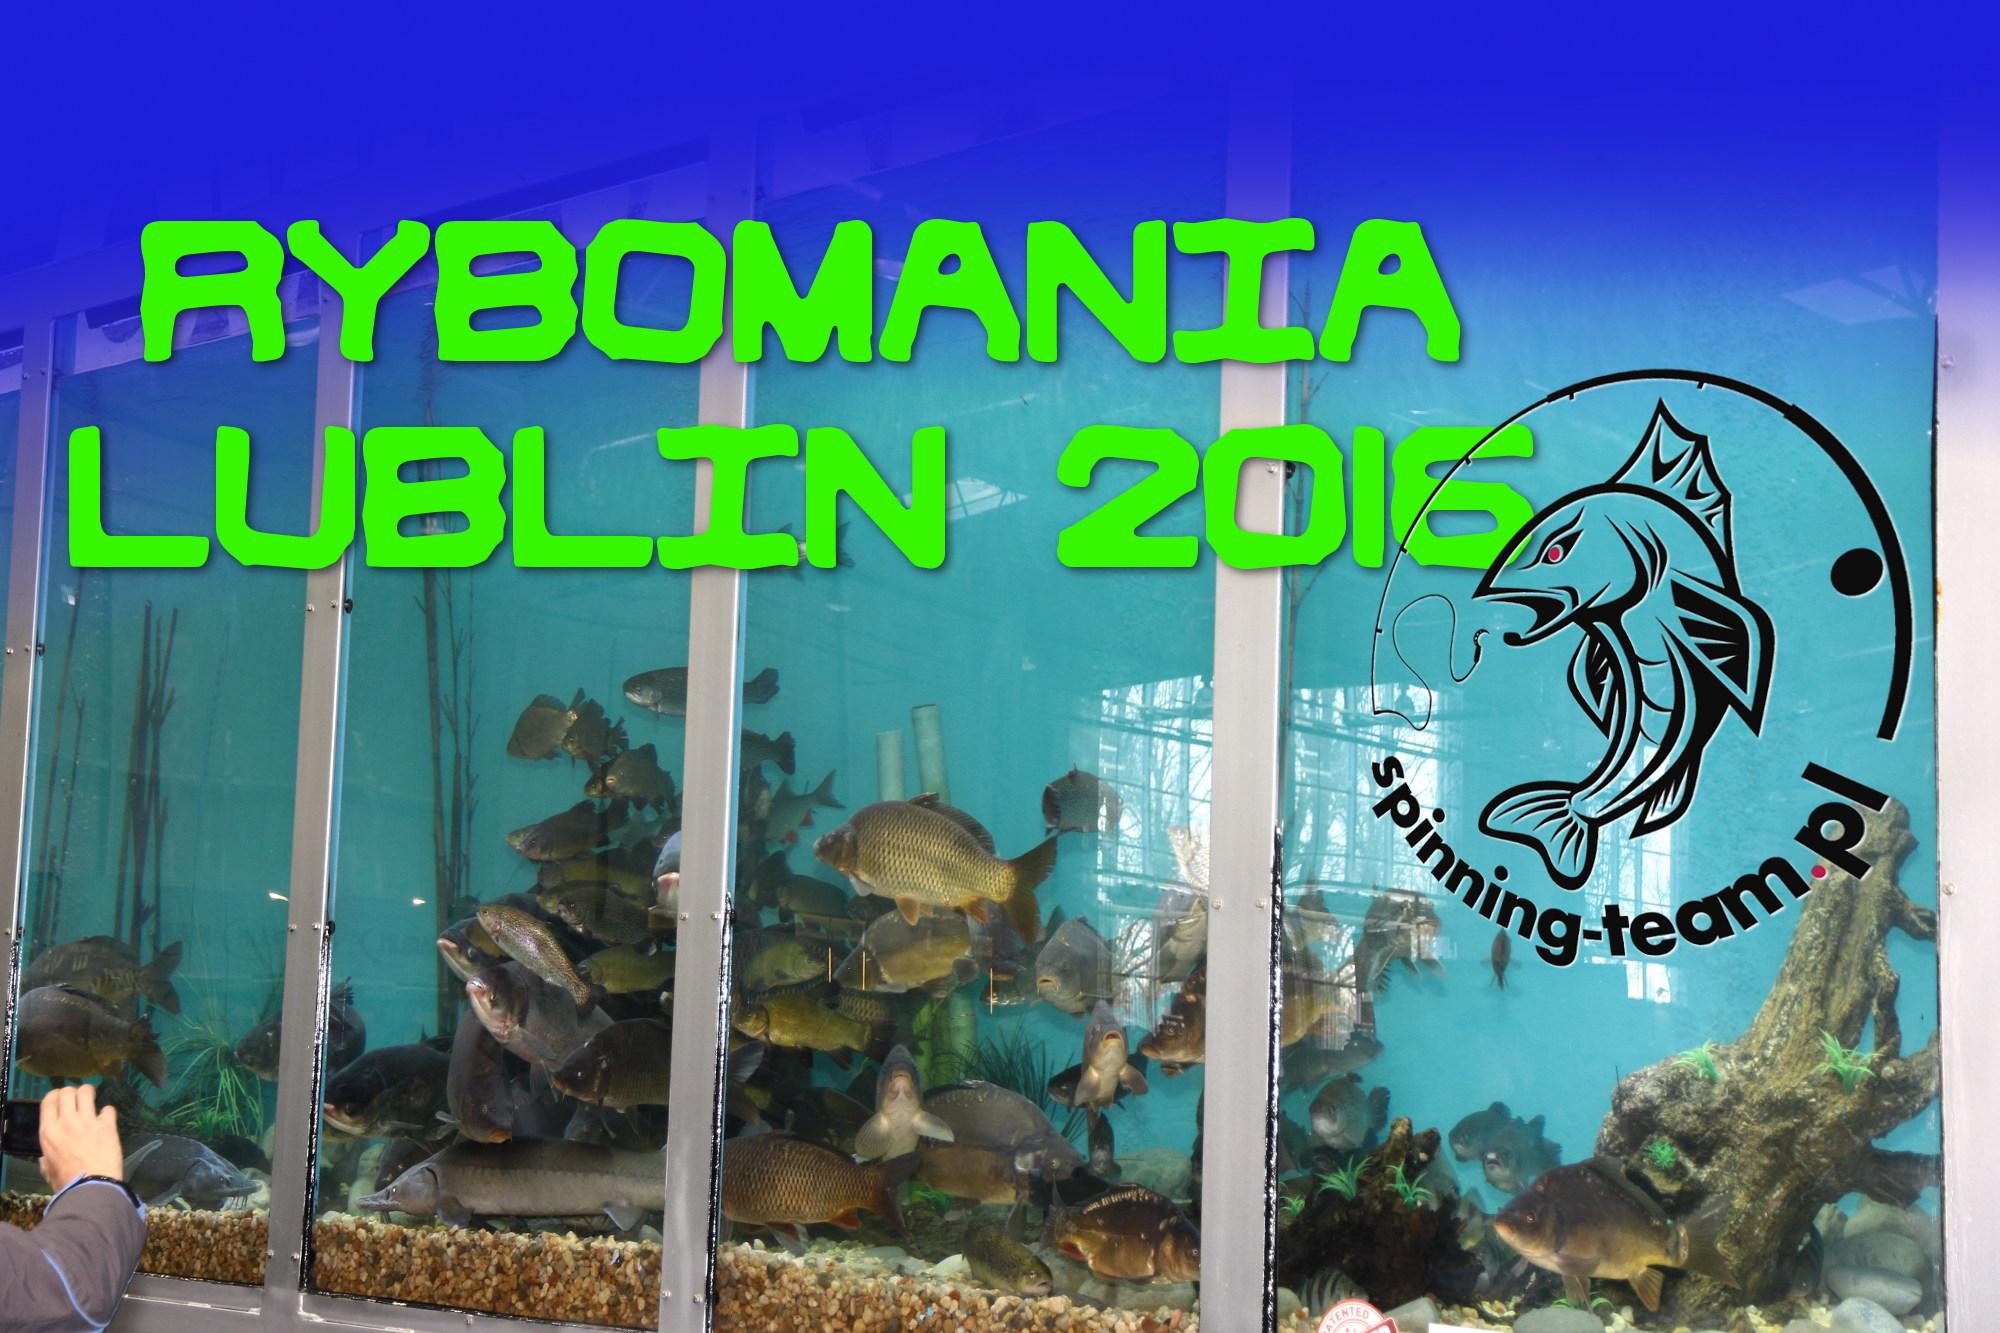 Rybomania 2016 Lublin